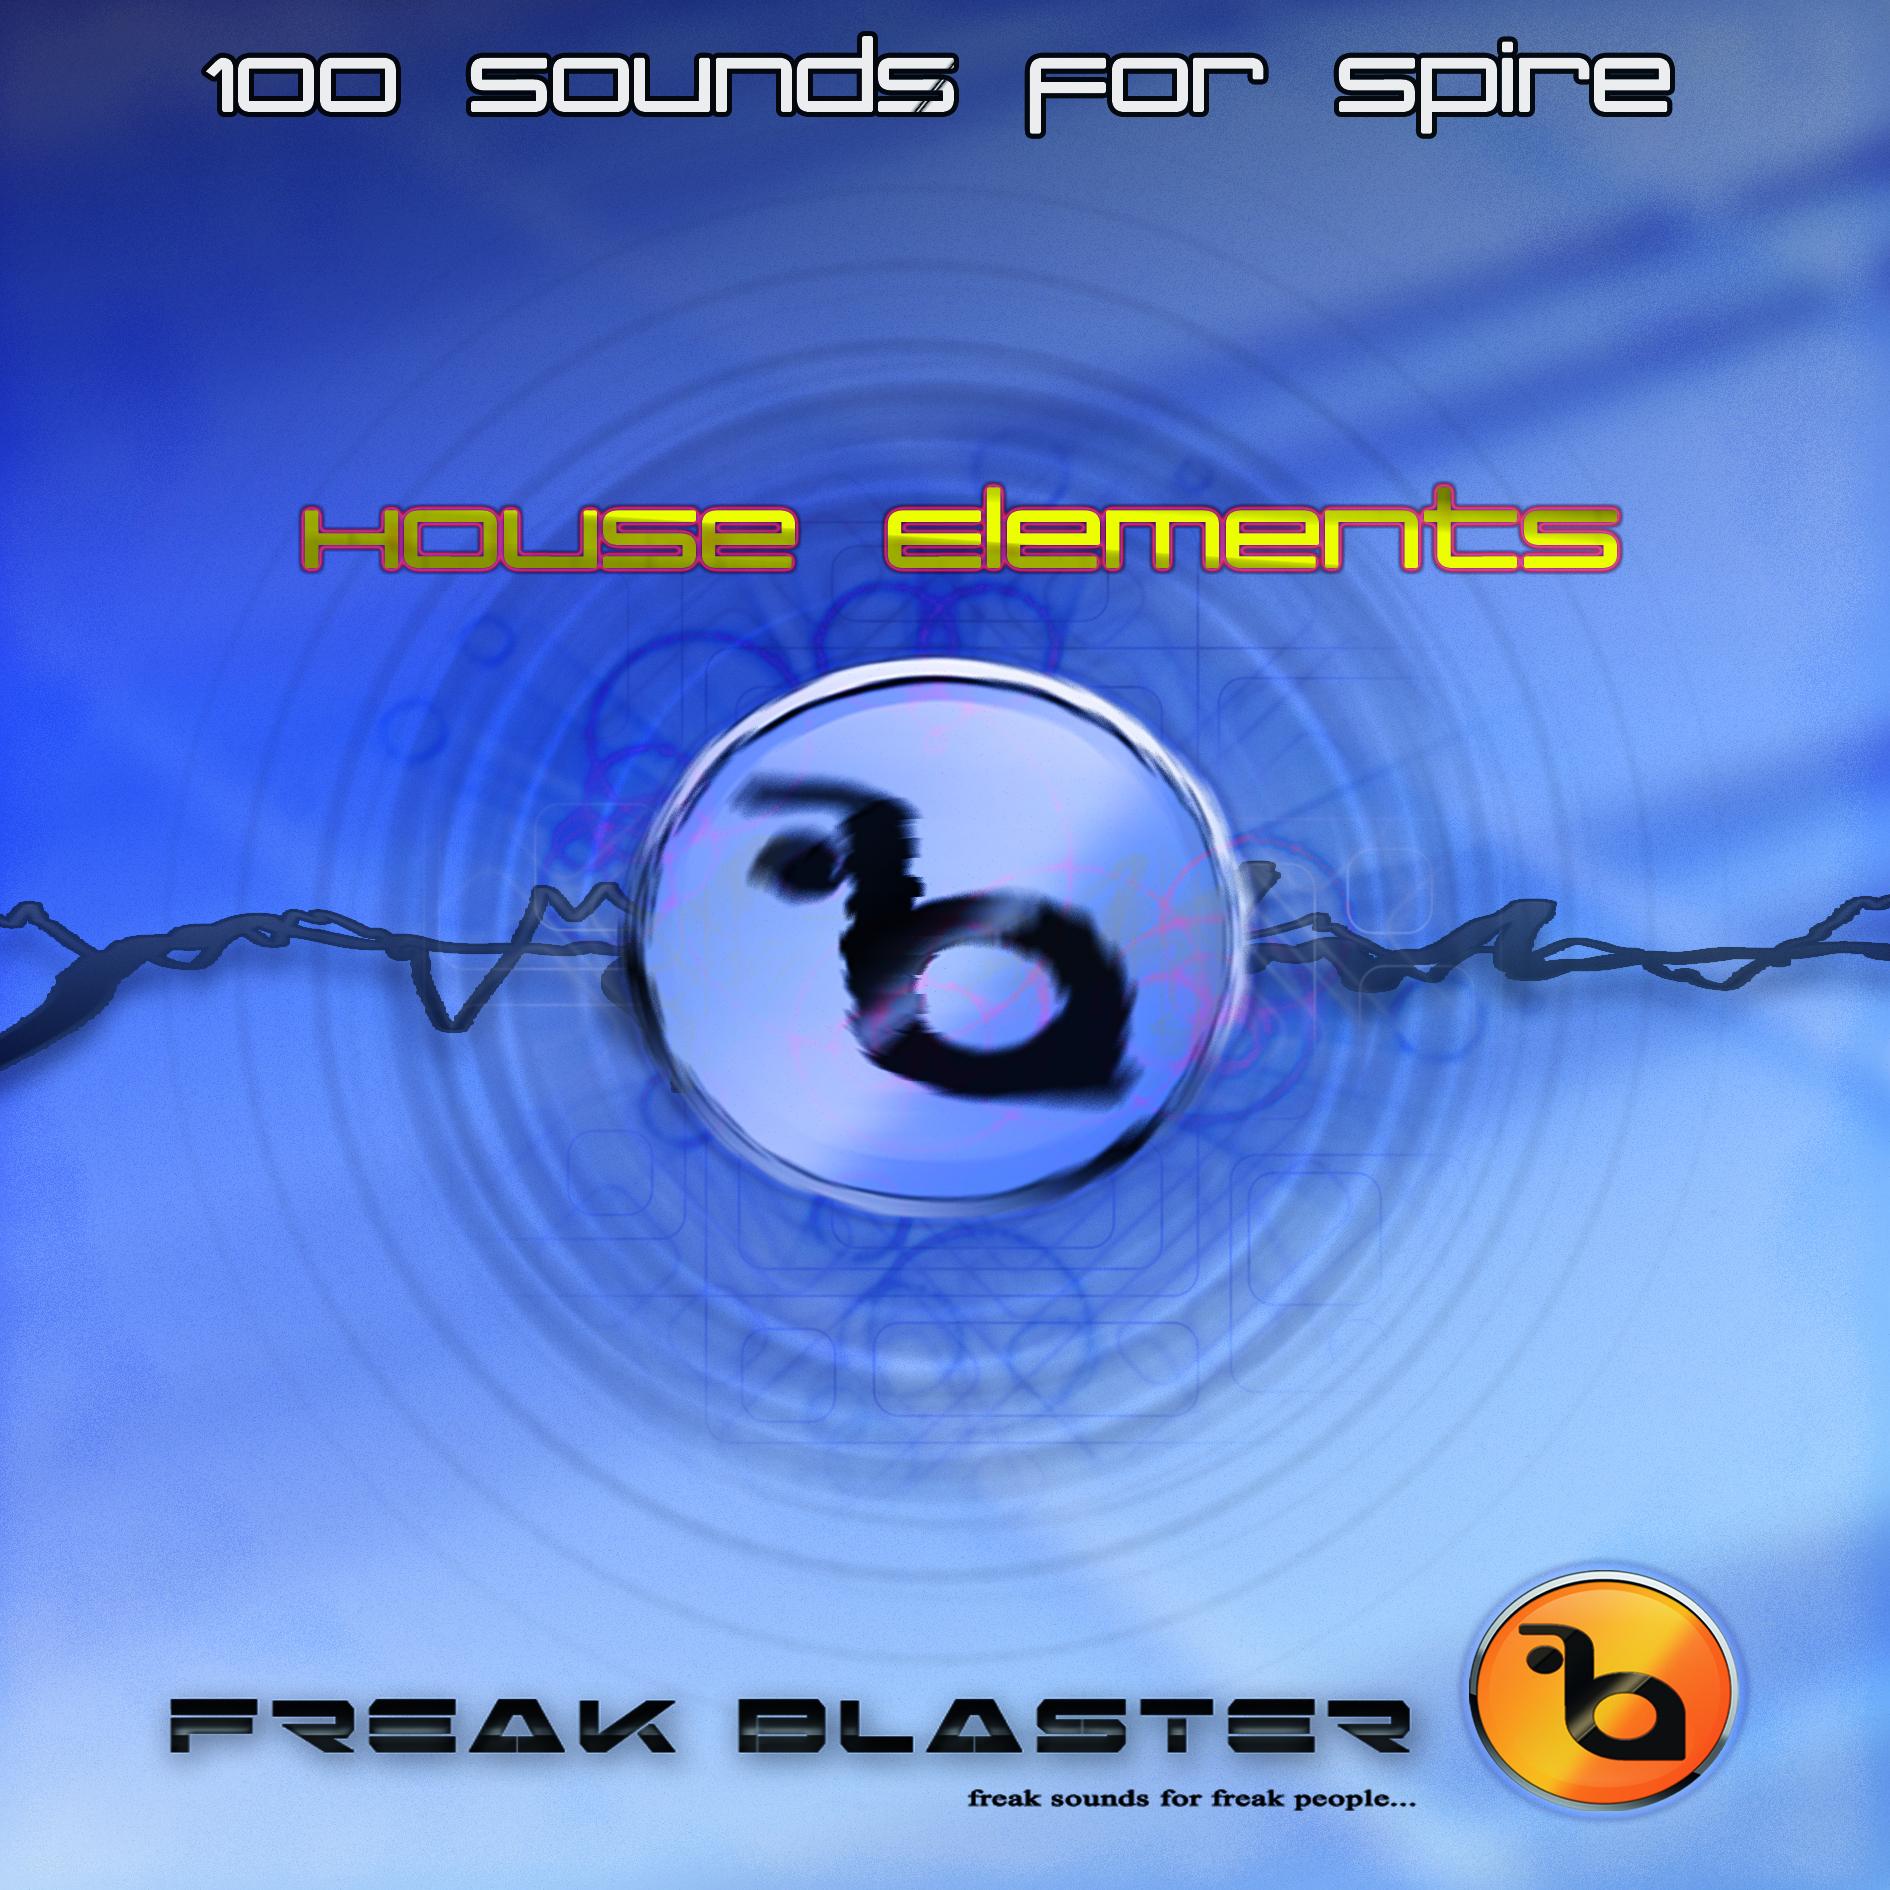 House Elements